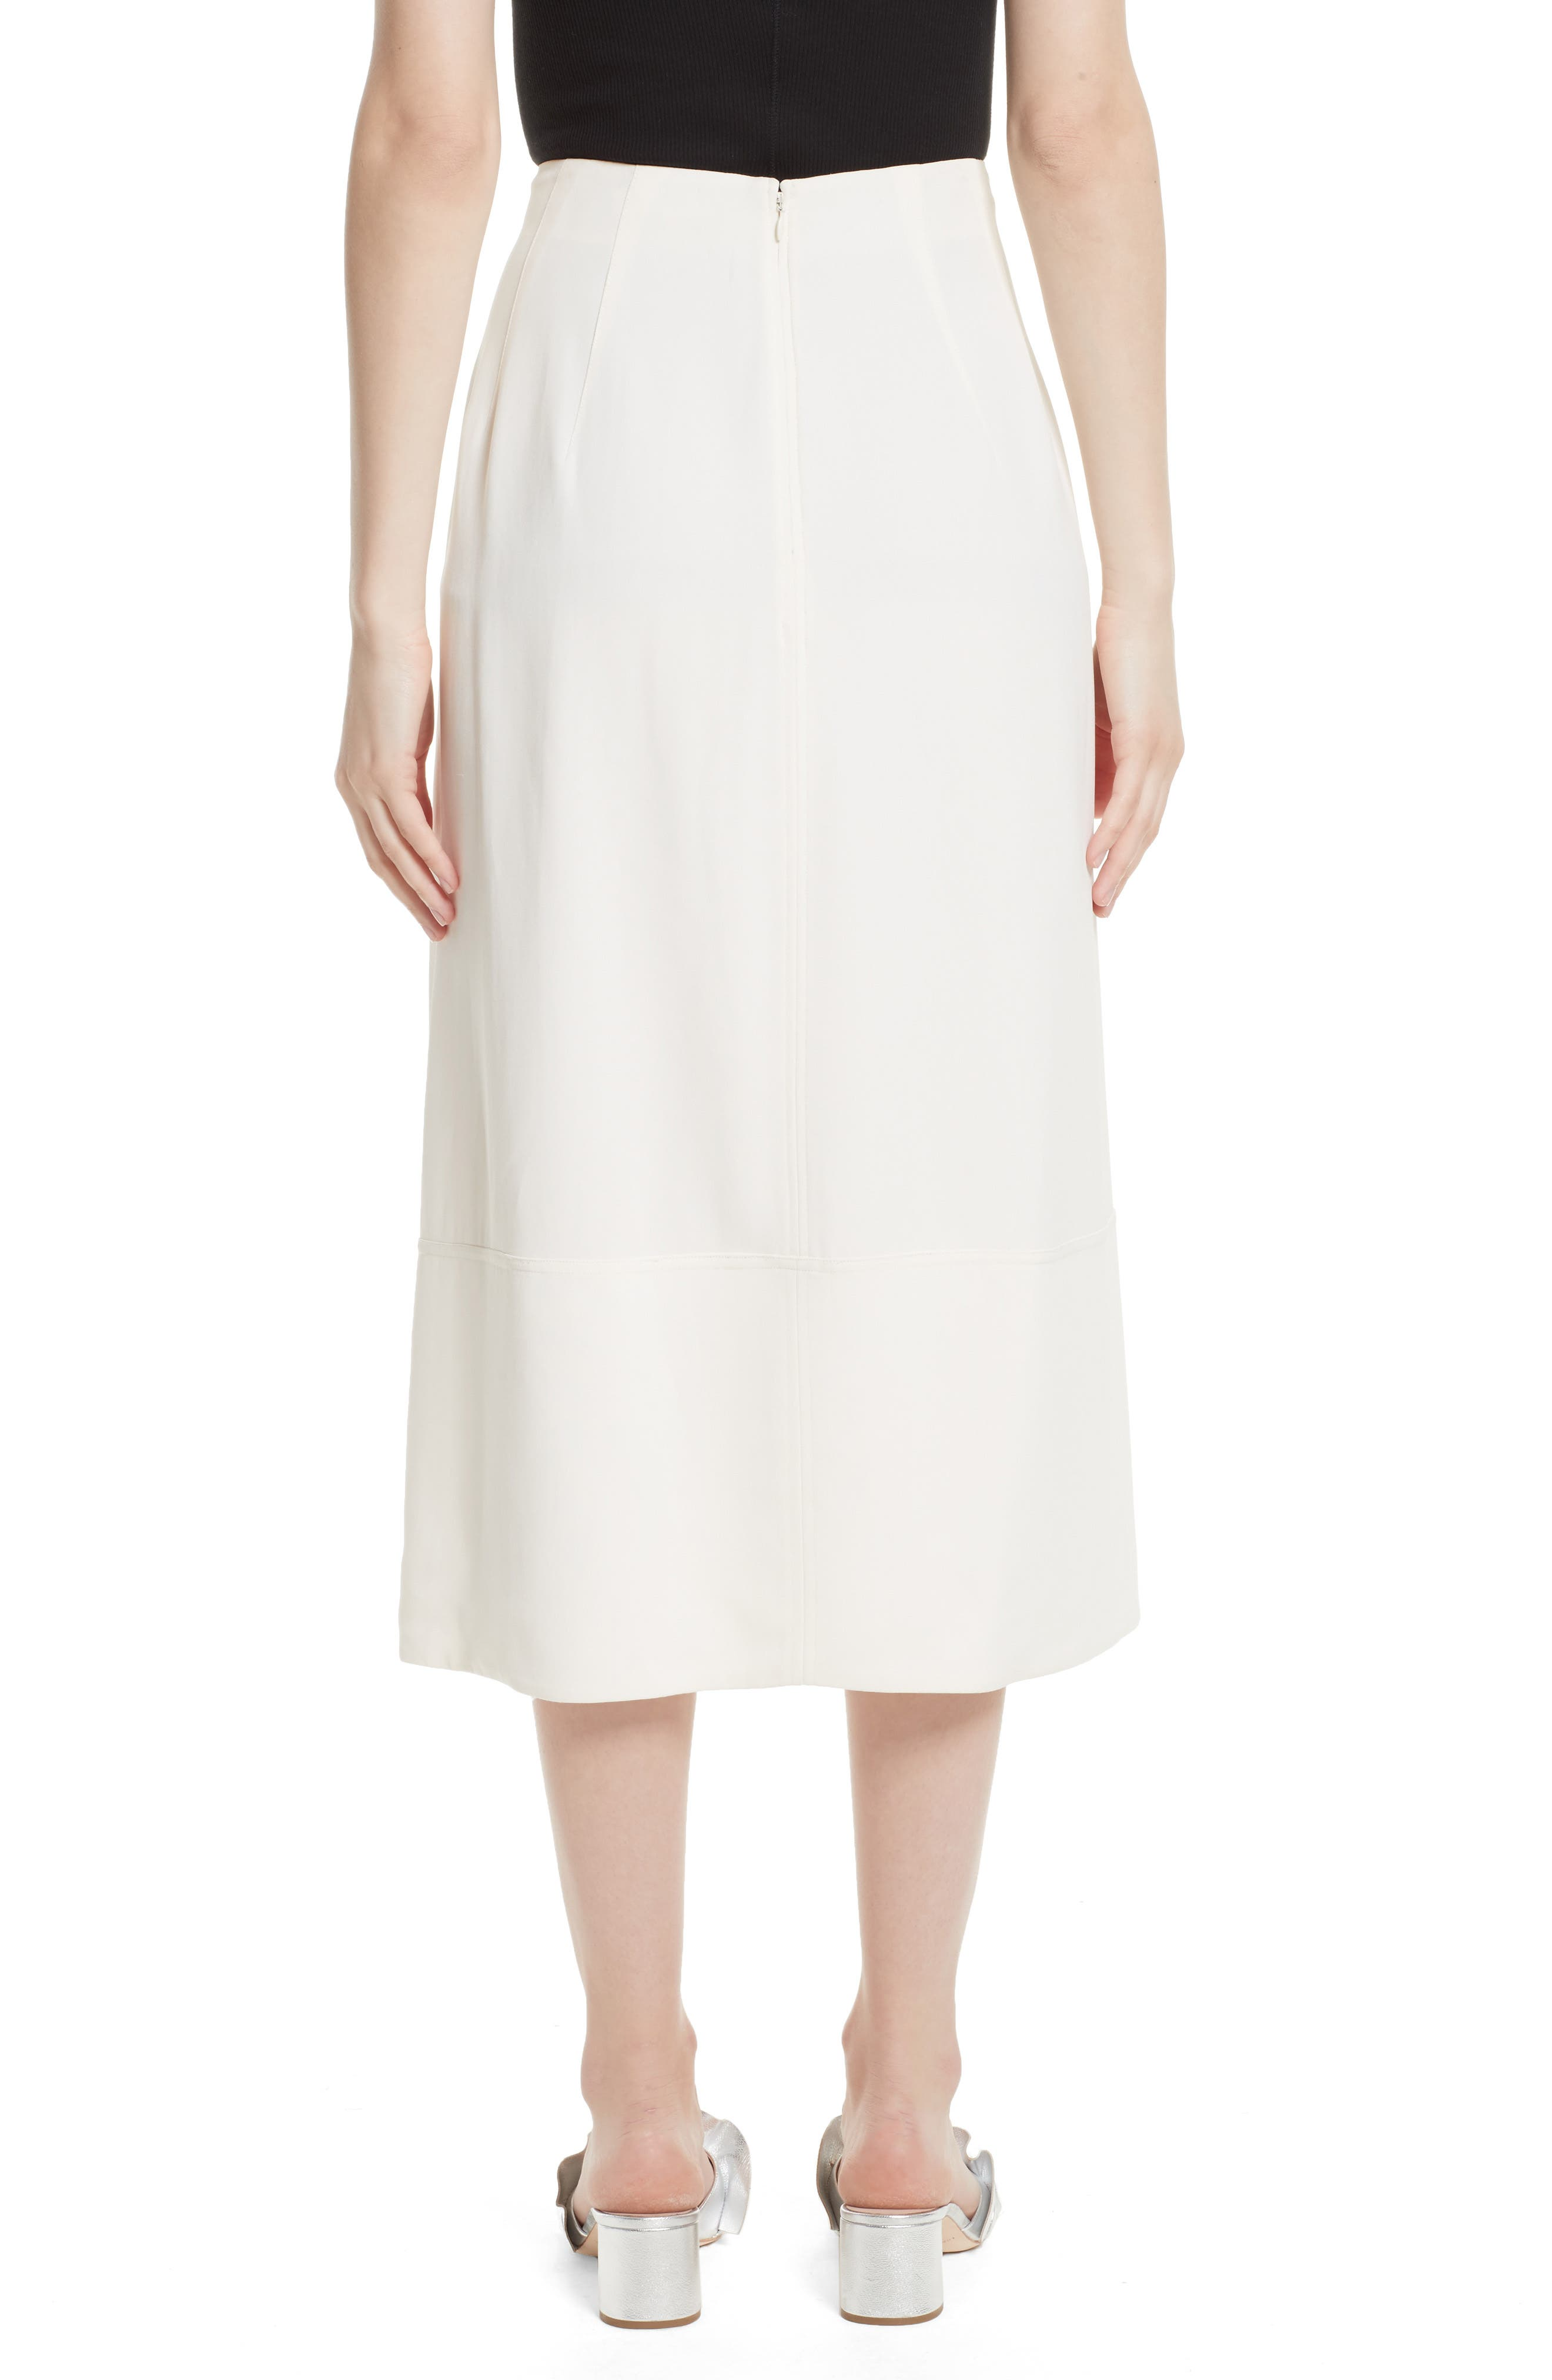 Lottie A-Line Midi Skirt,                             Alternate thumbnail 2, color,                             903